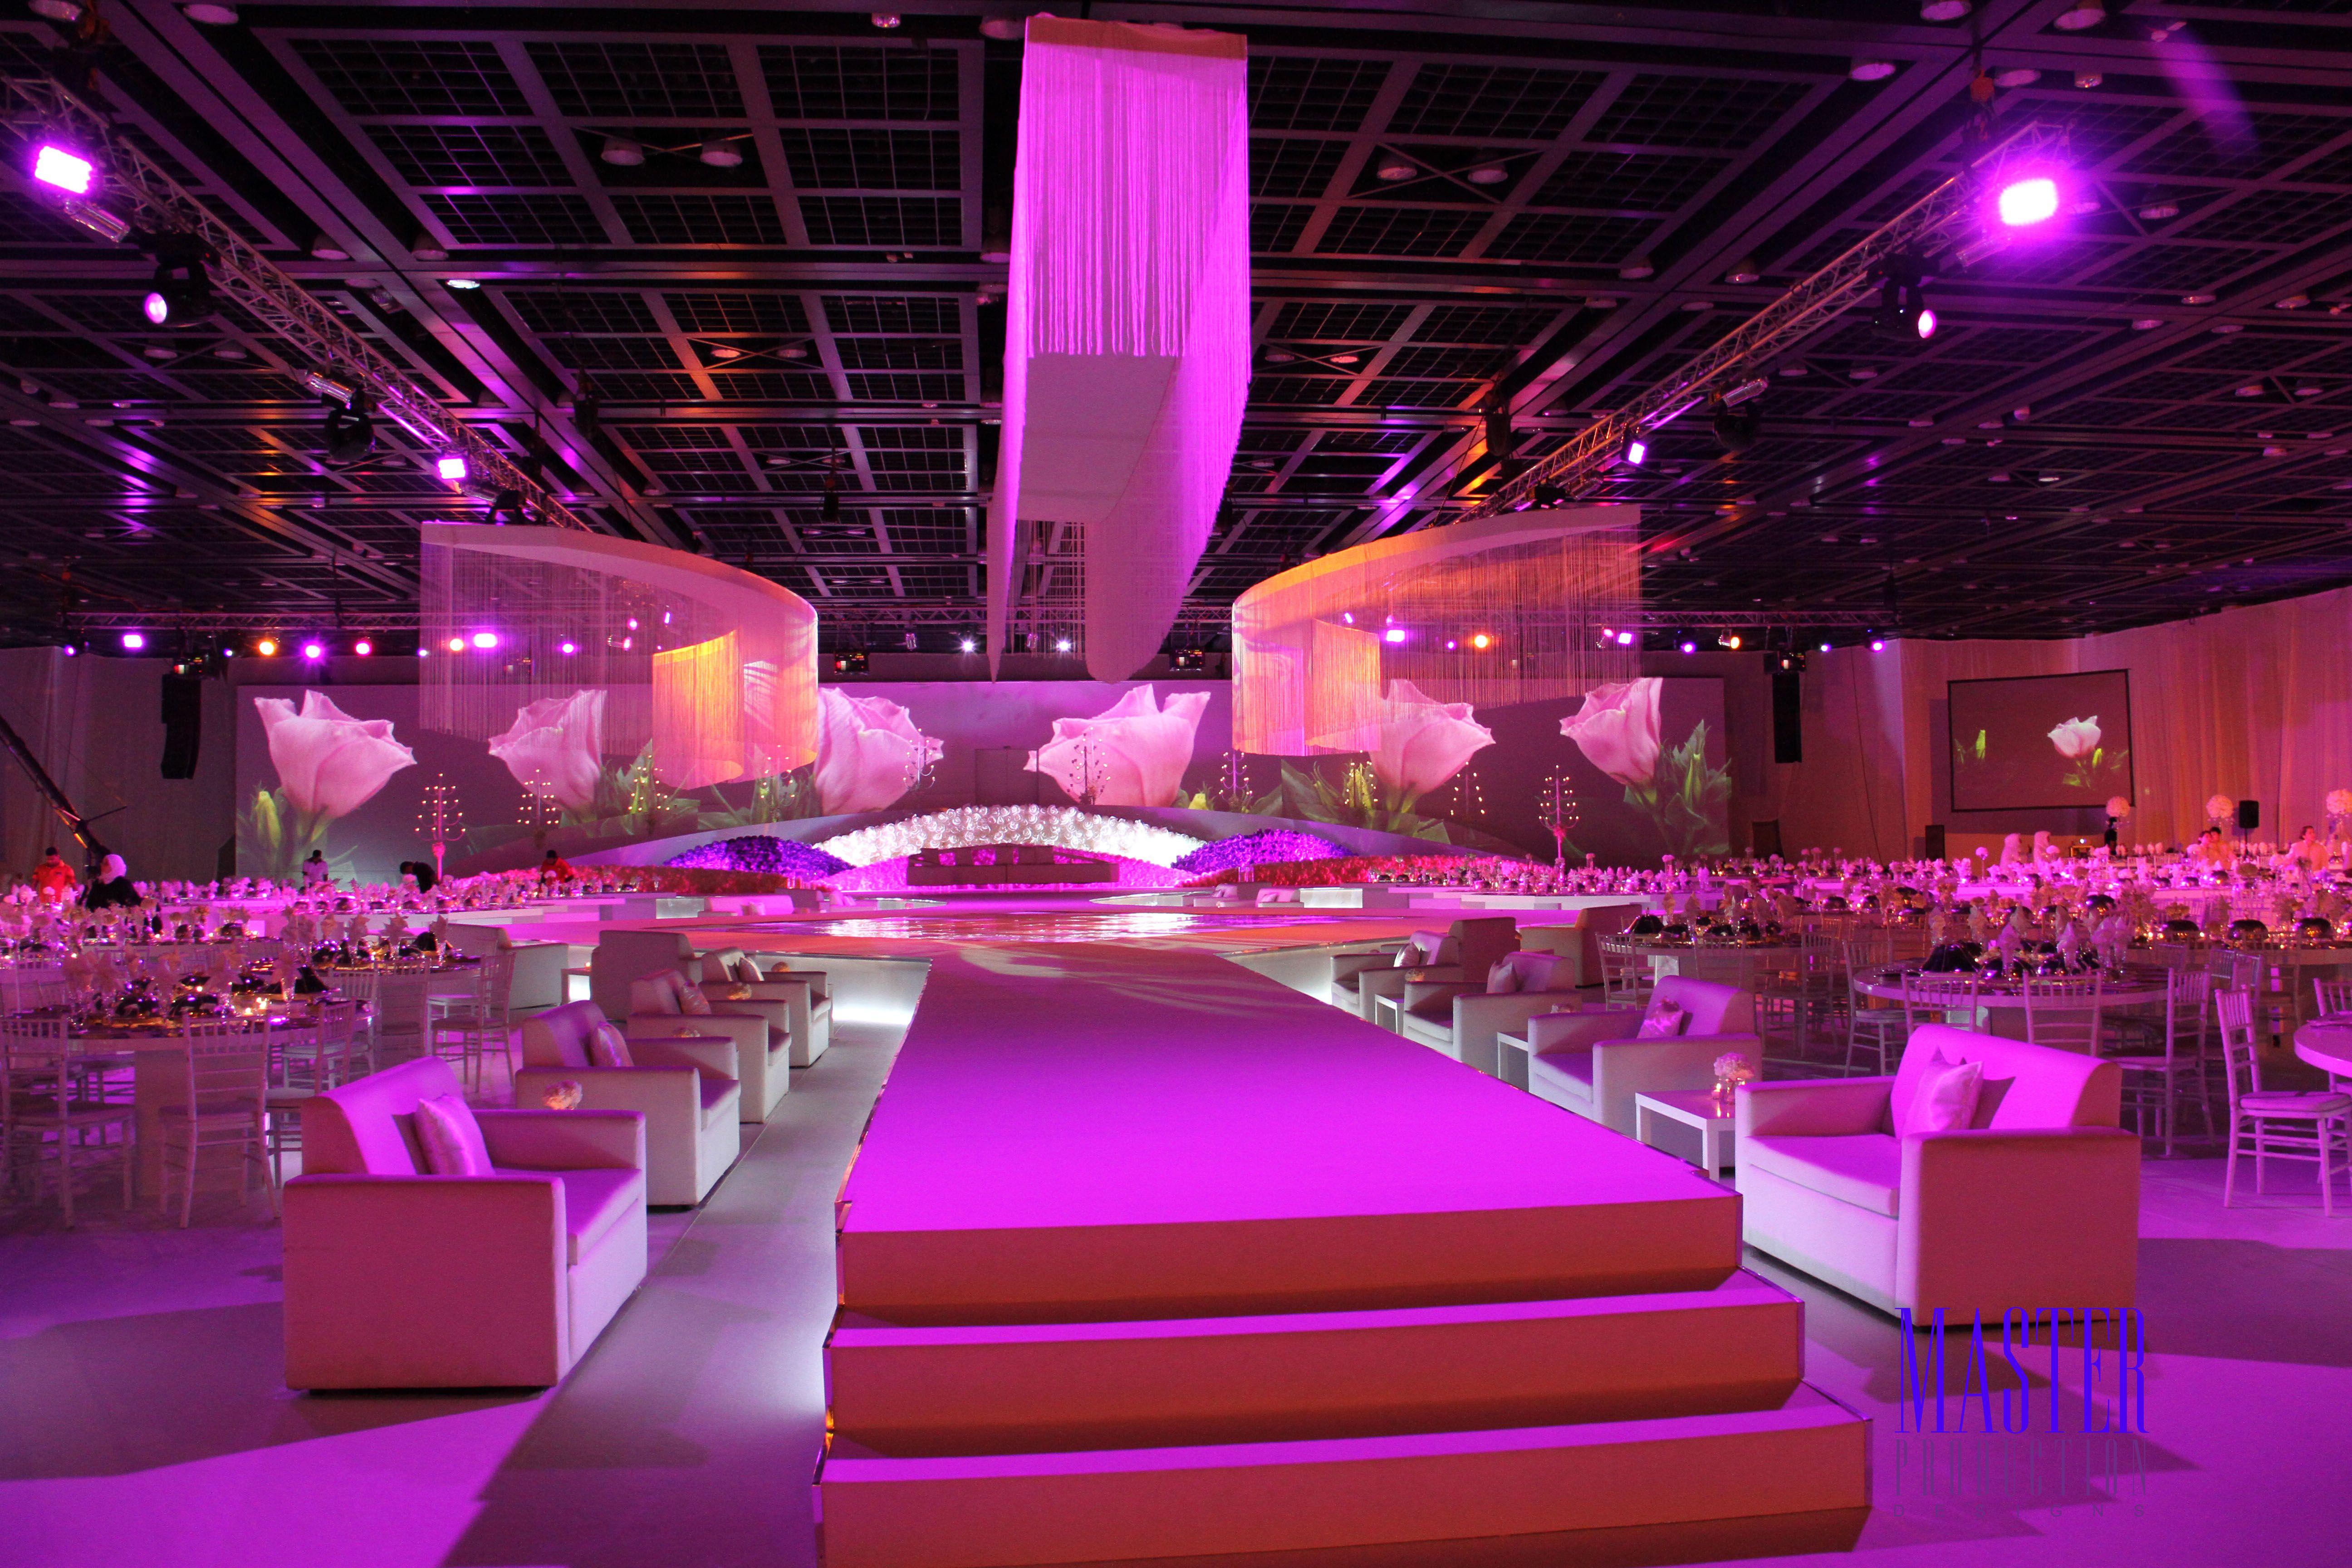 Wedding stage decoration dubai  Arabic wedding set up in Dubai  porm party  Pinterest